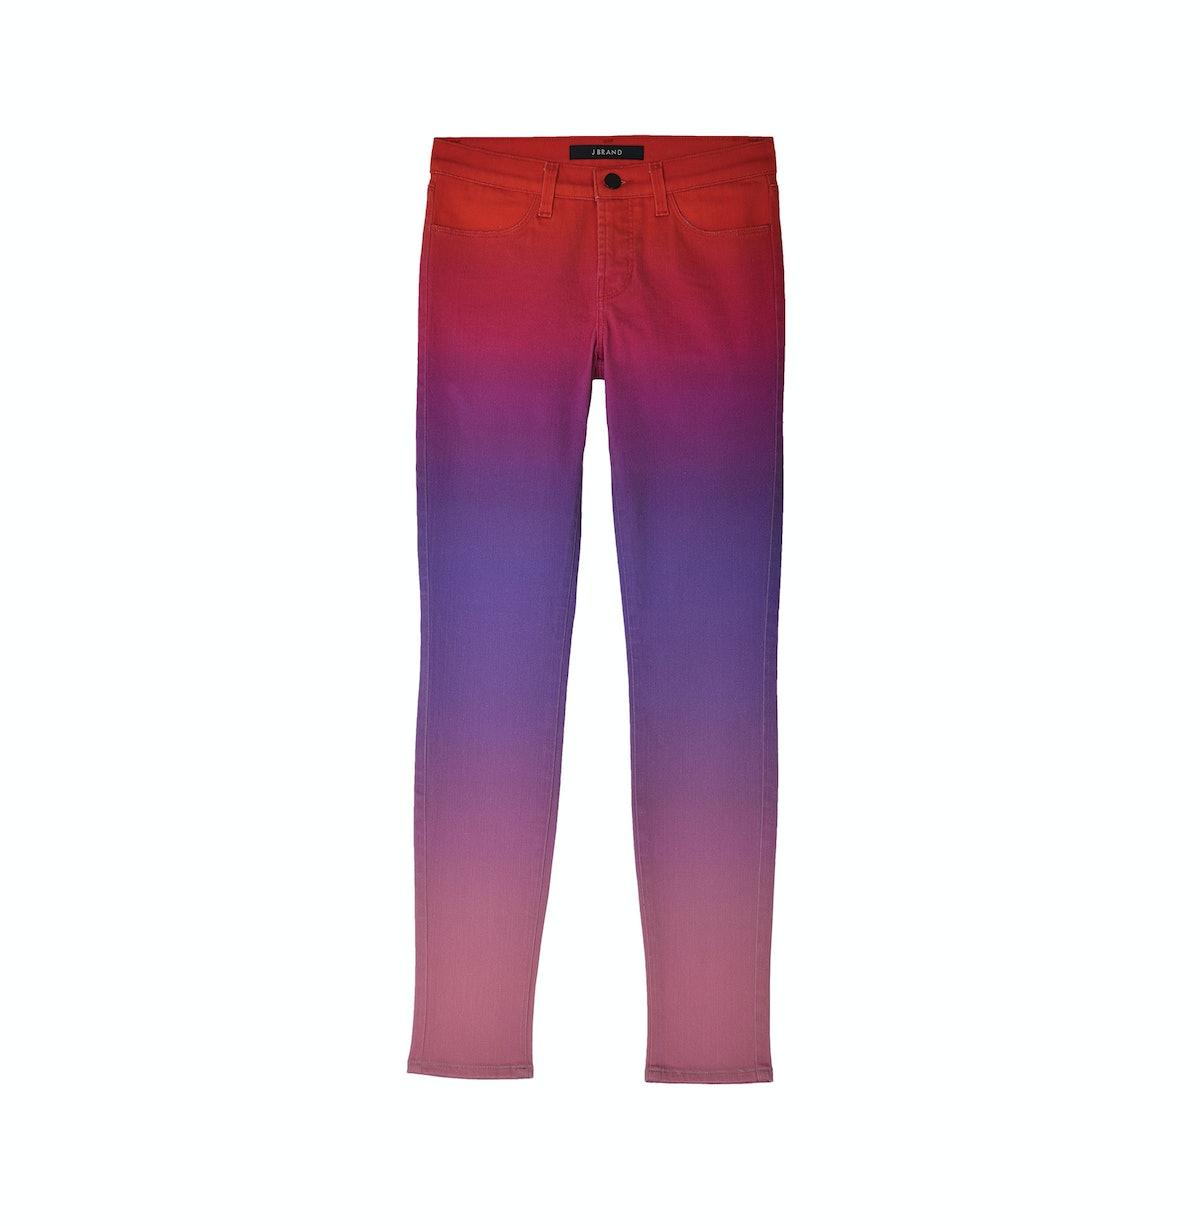 j-brand-rob-pruitt-jeans